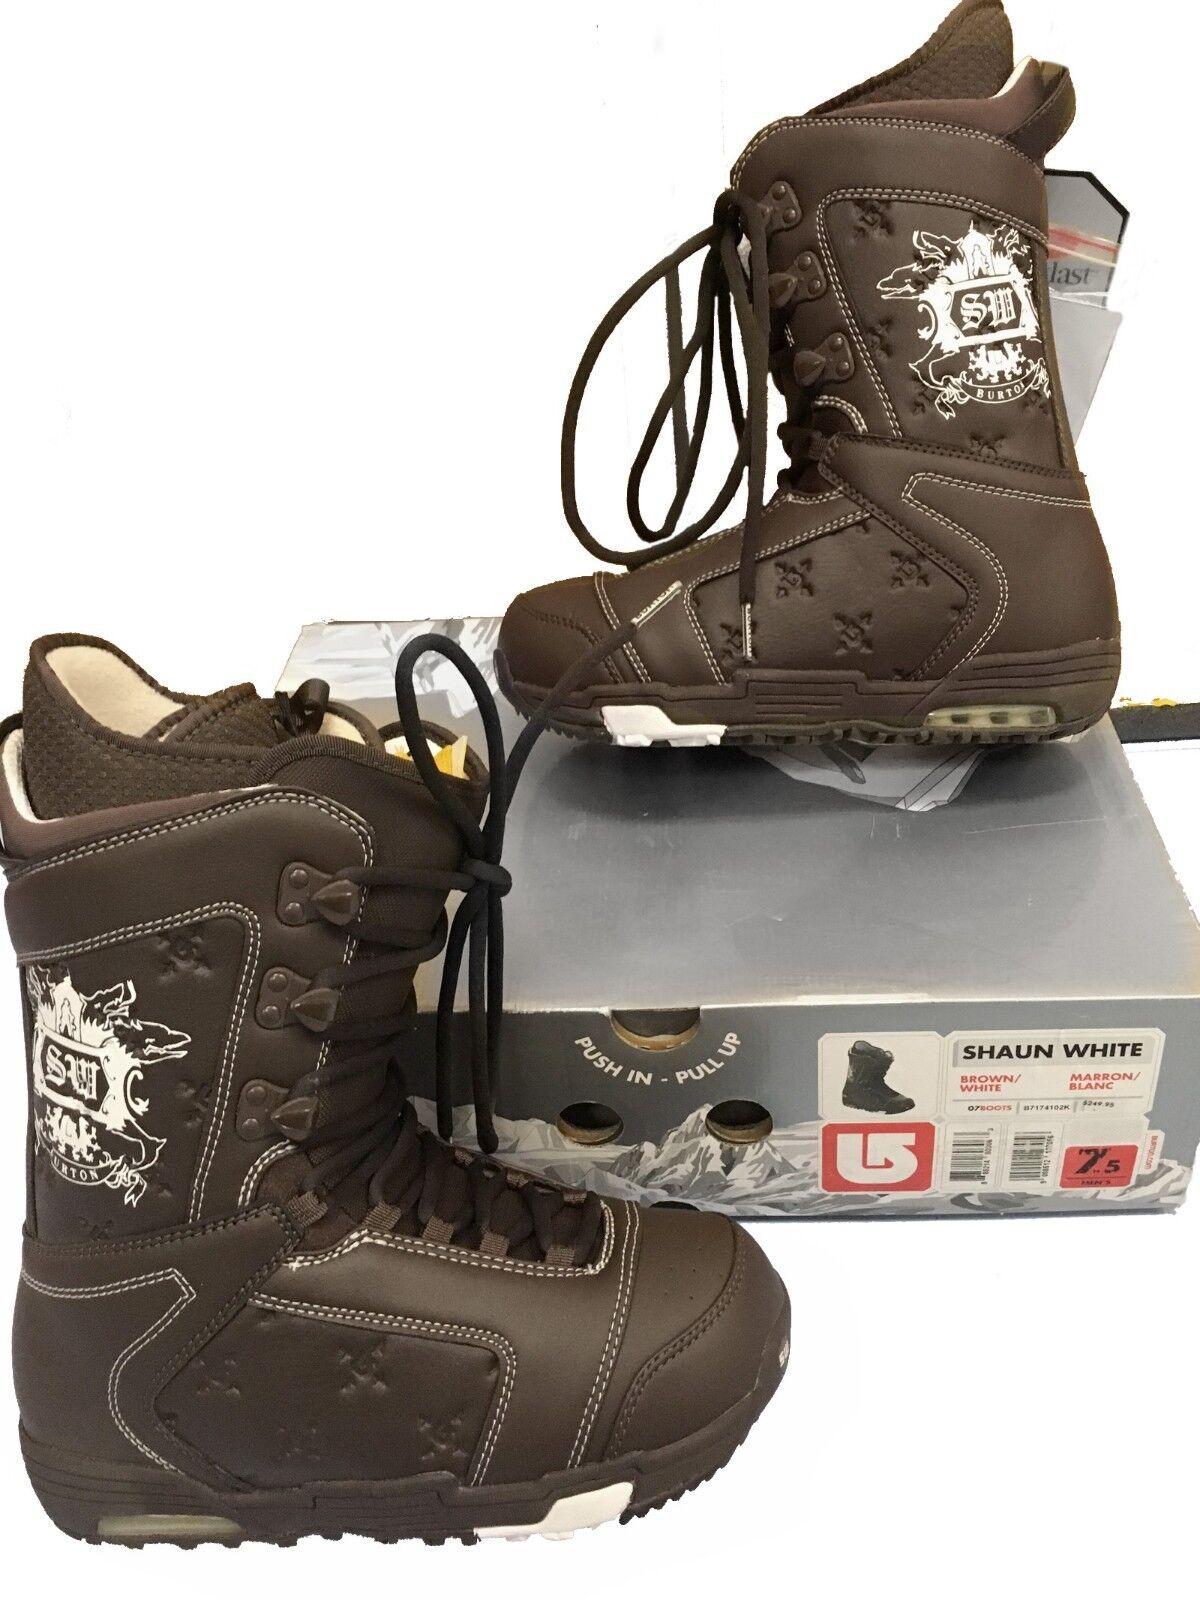 NEW  270 Burton Shaun White Snowboard Boots  US 7.5 Mond 25.5 Euro 40.5 Q